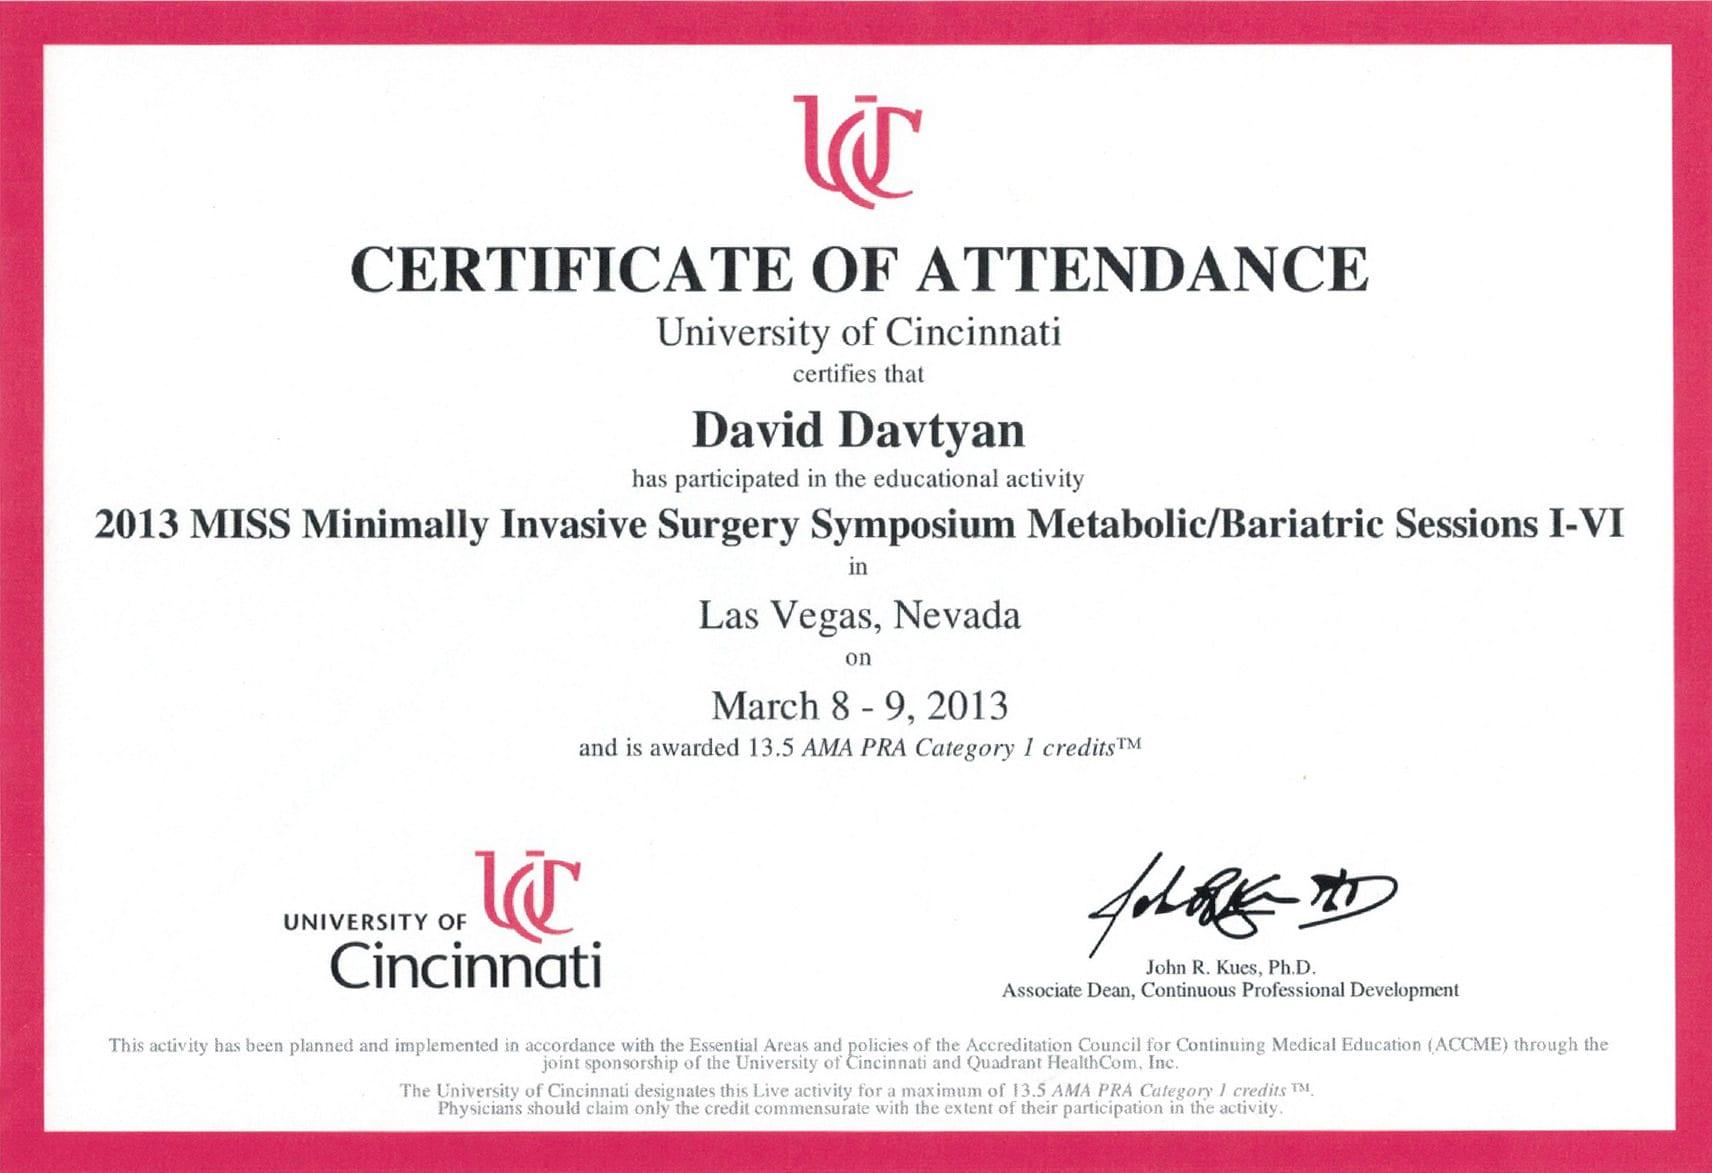 Dr. David Davtyan's University of Cincinnati 2013 MISS Minimally Invasive Surgery Symposium Metabolic Bariatric Certificate